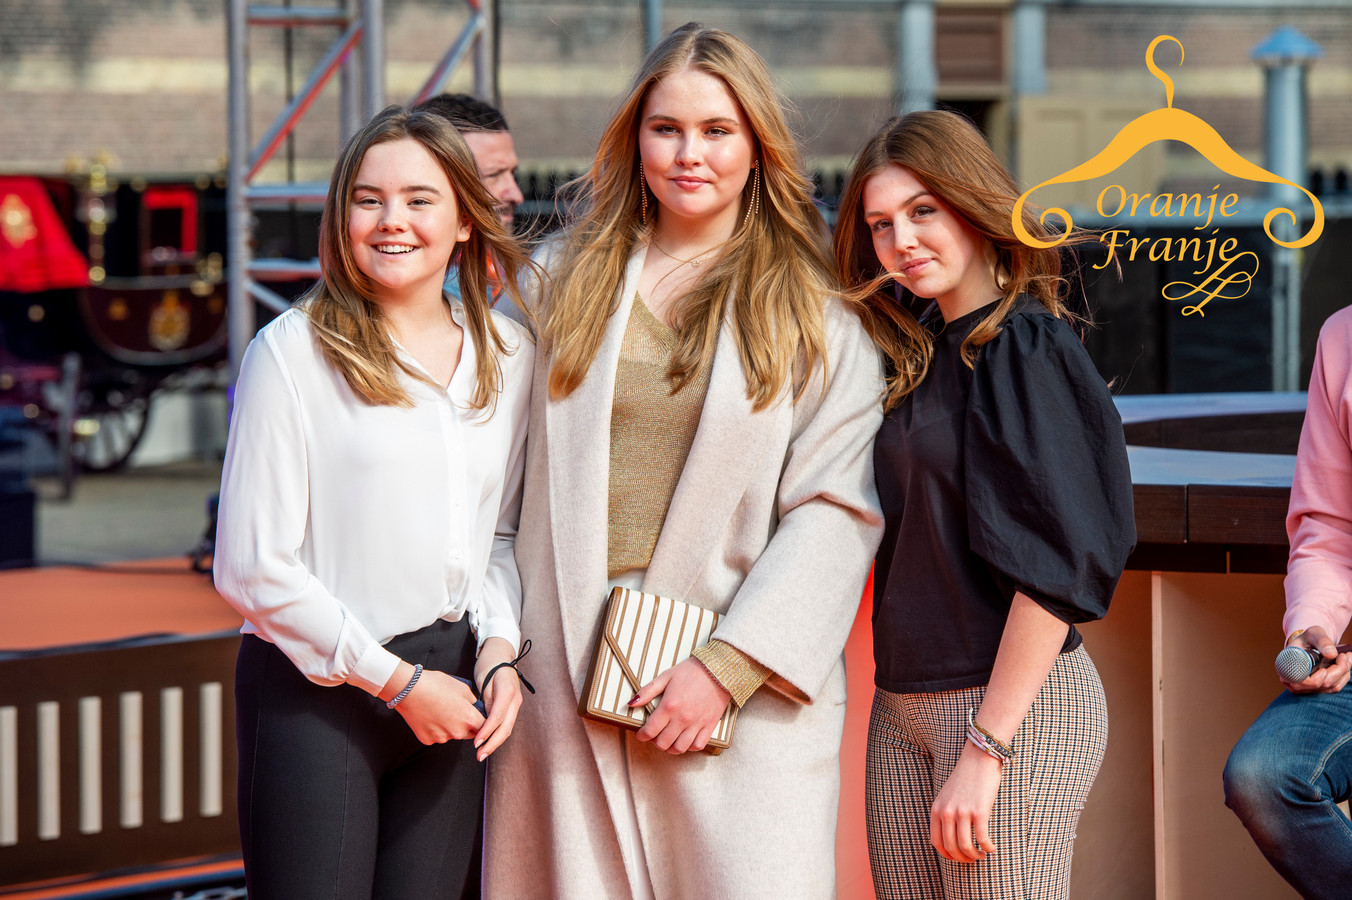 De prinsessen tijdens Koningsdag: Ariane, Amalia en Alexia.